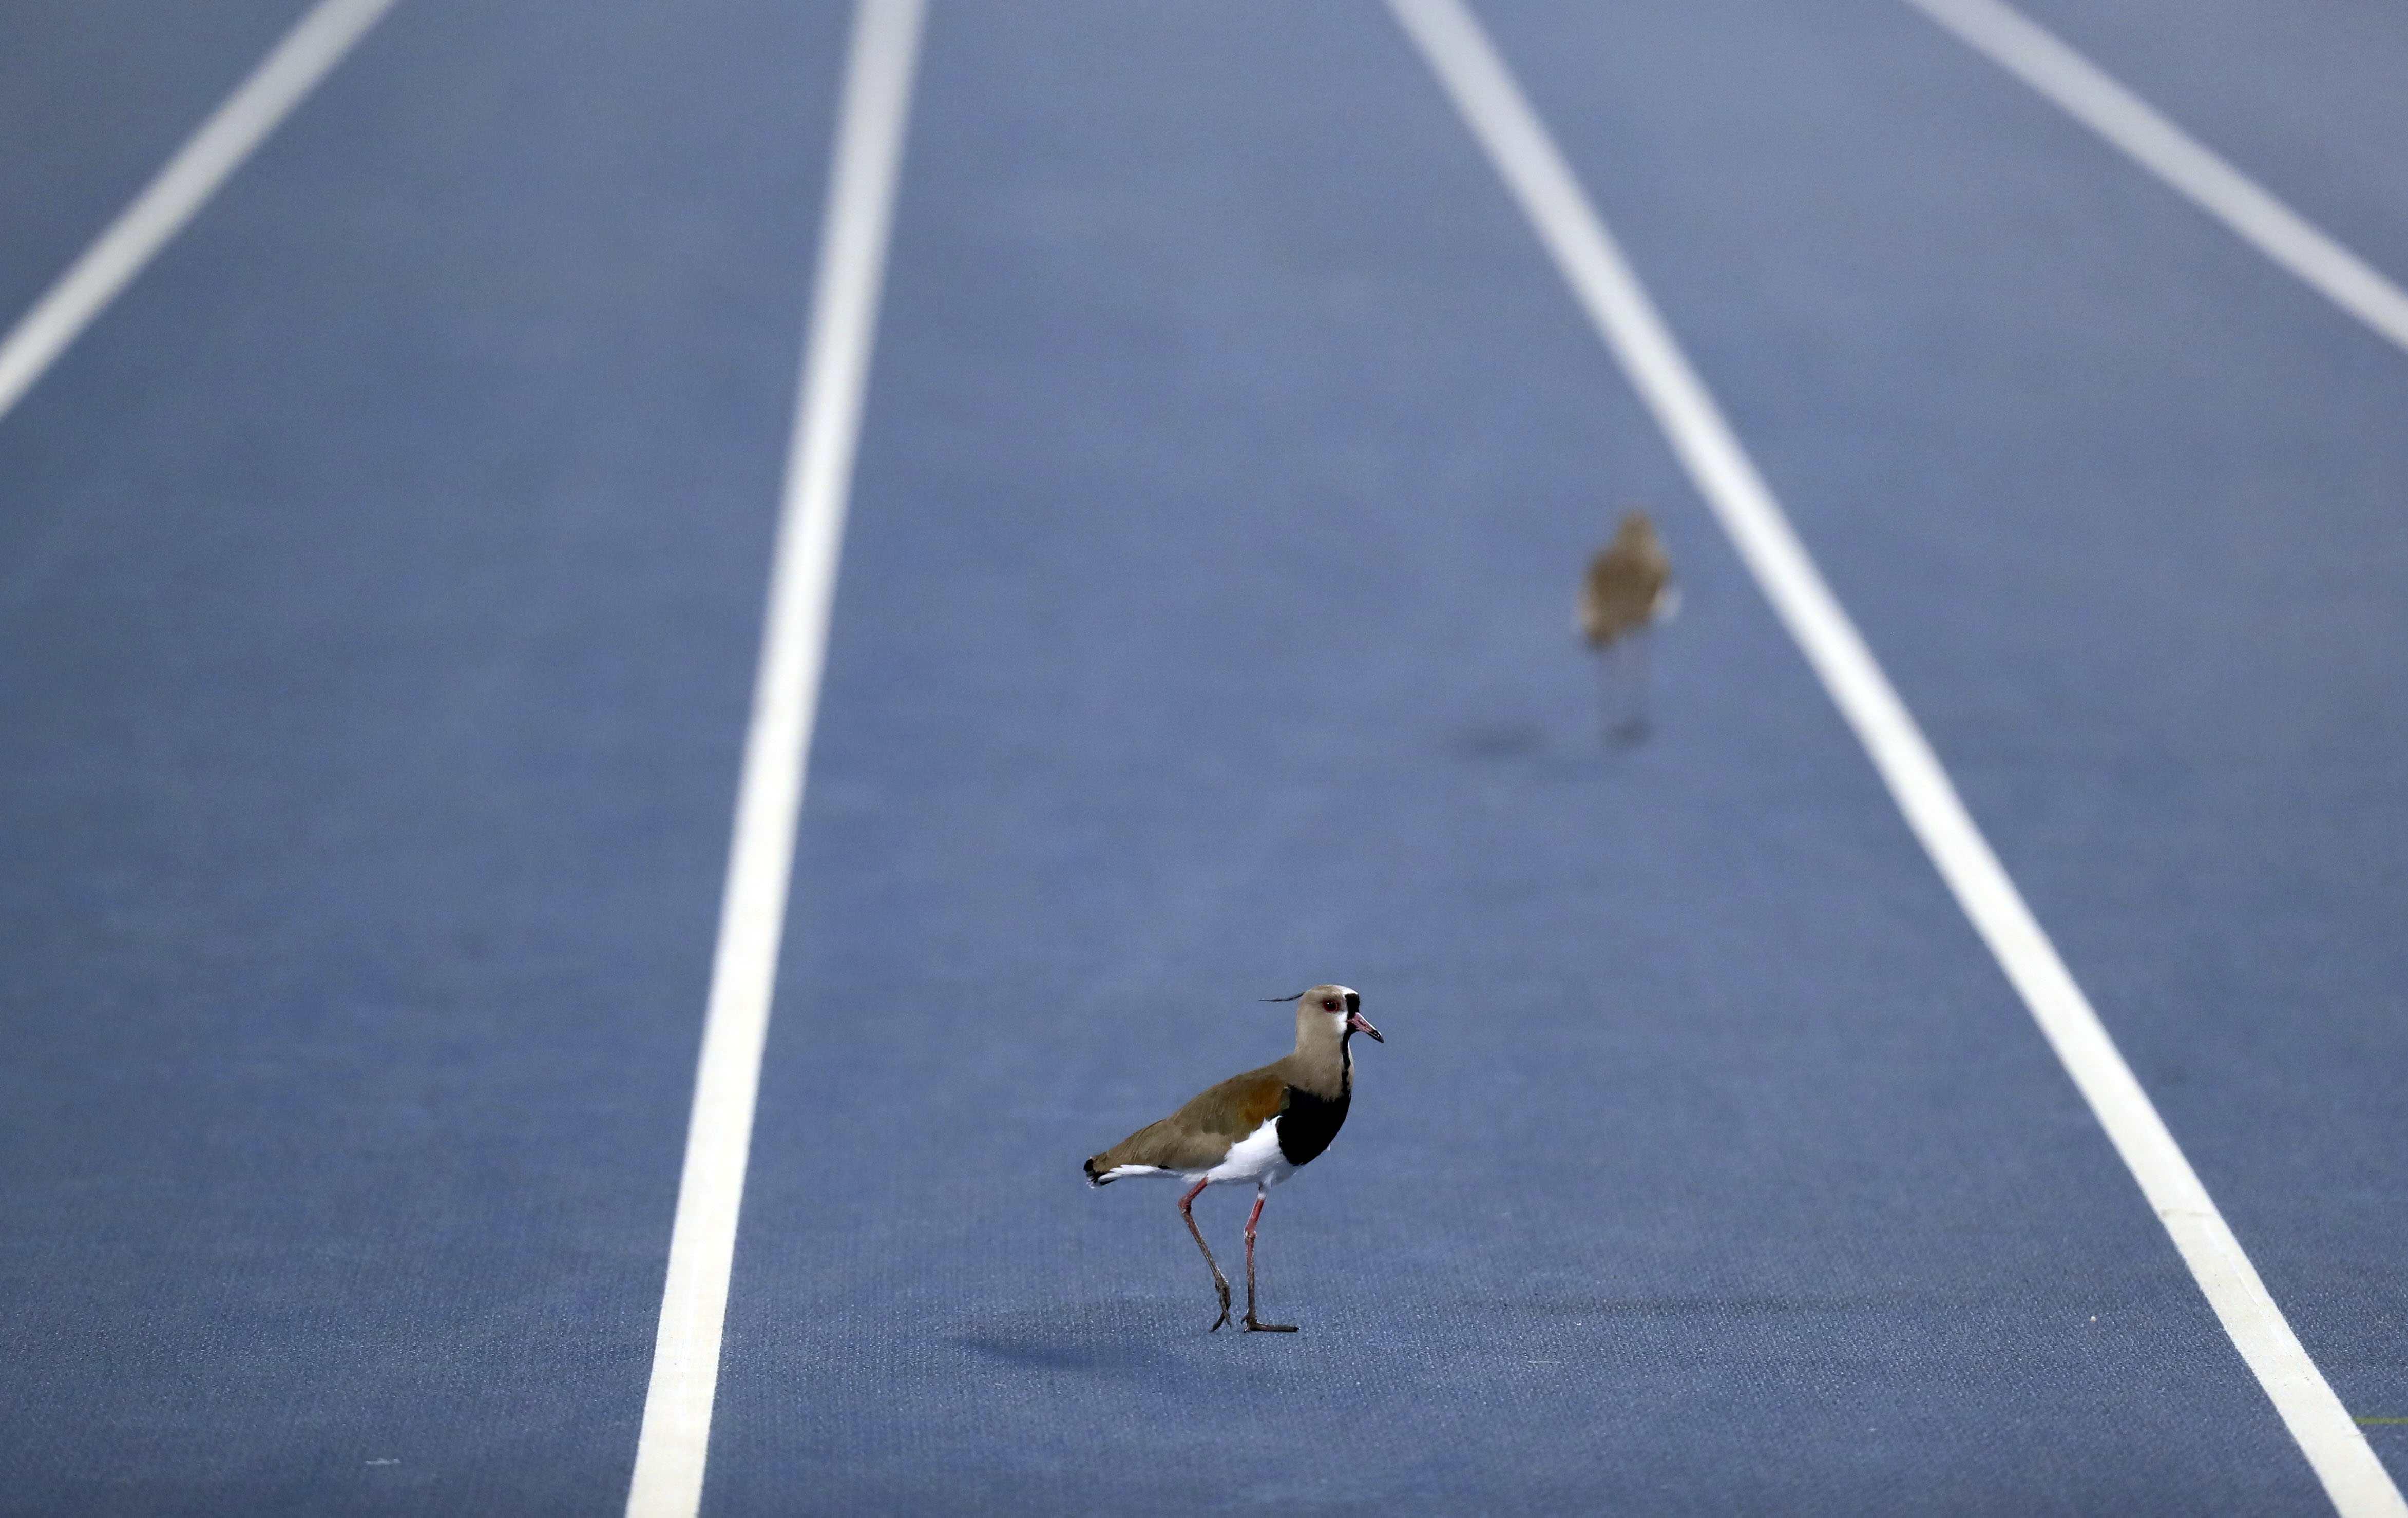 Birds on a track during the 2016 Rio Olympics, Men's High Jump Final in Rio de Janeiro, Brazil, on Aug. 16, 2016.